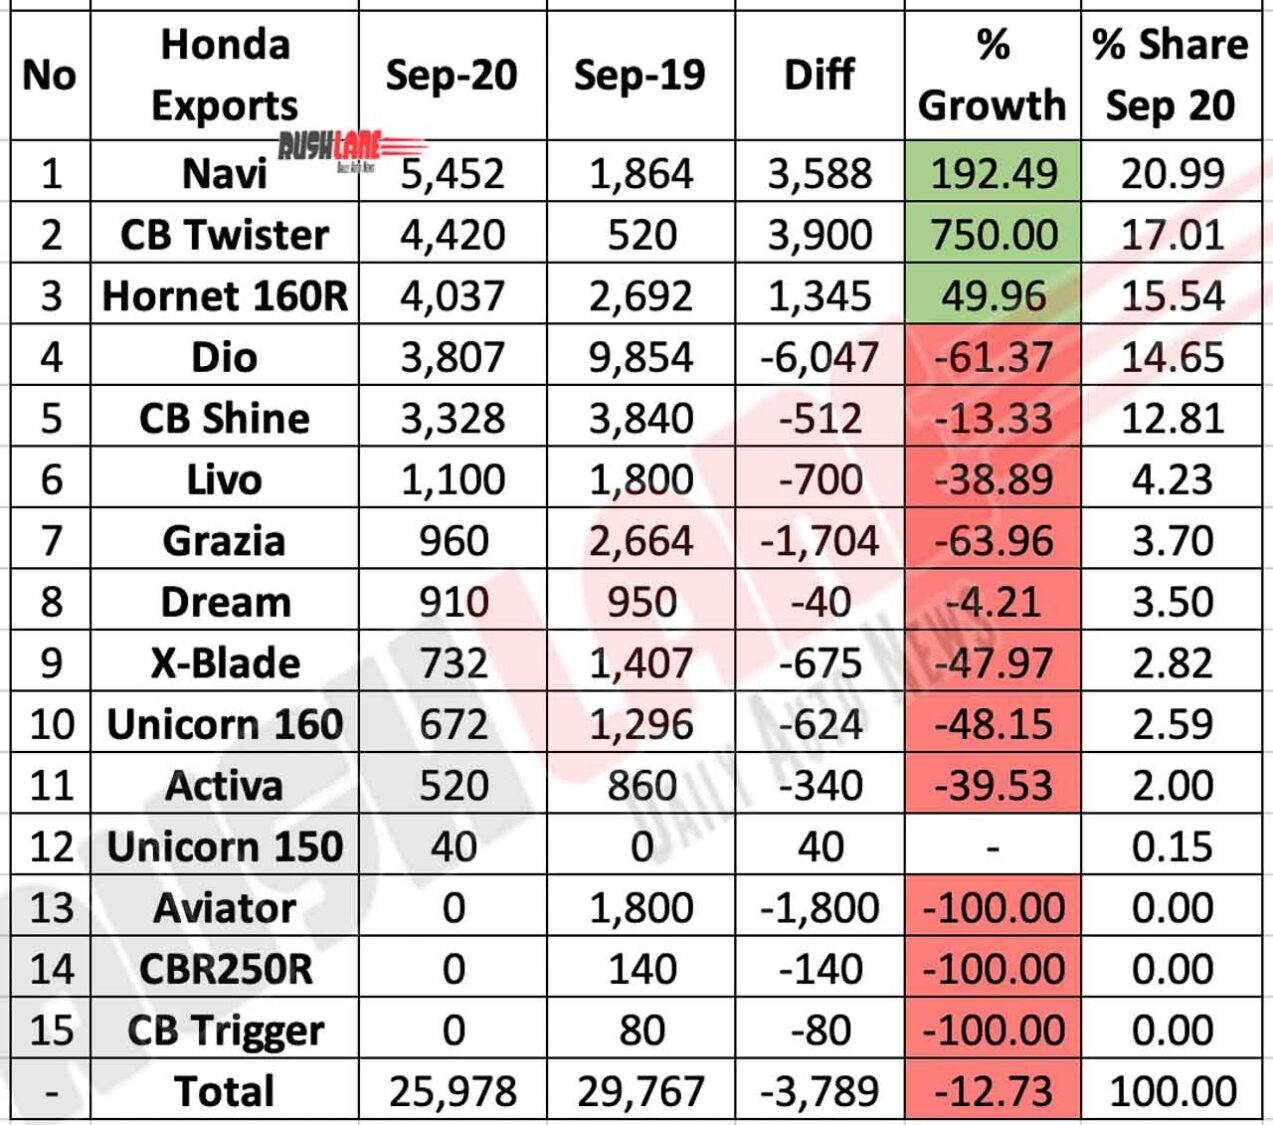 Honda Two Wheelers Exports Sep 2020